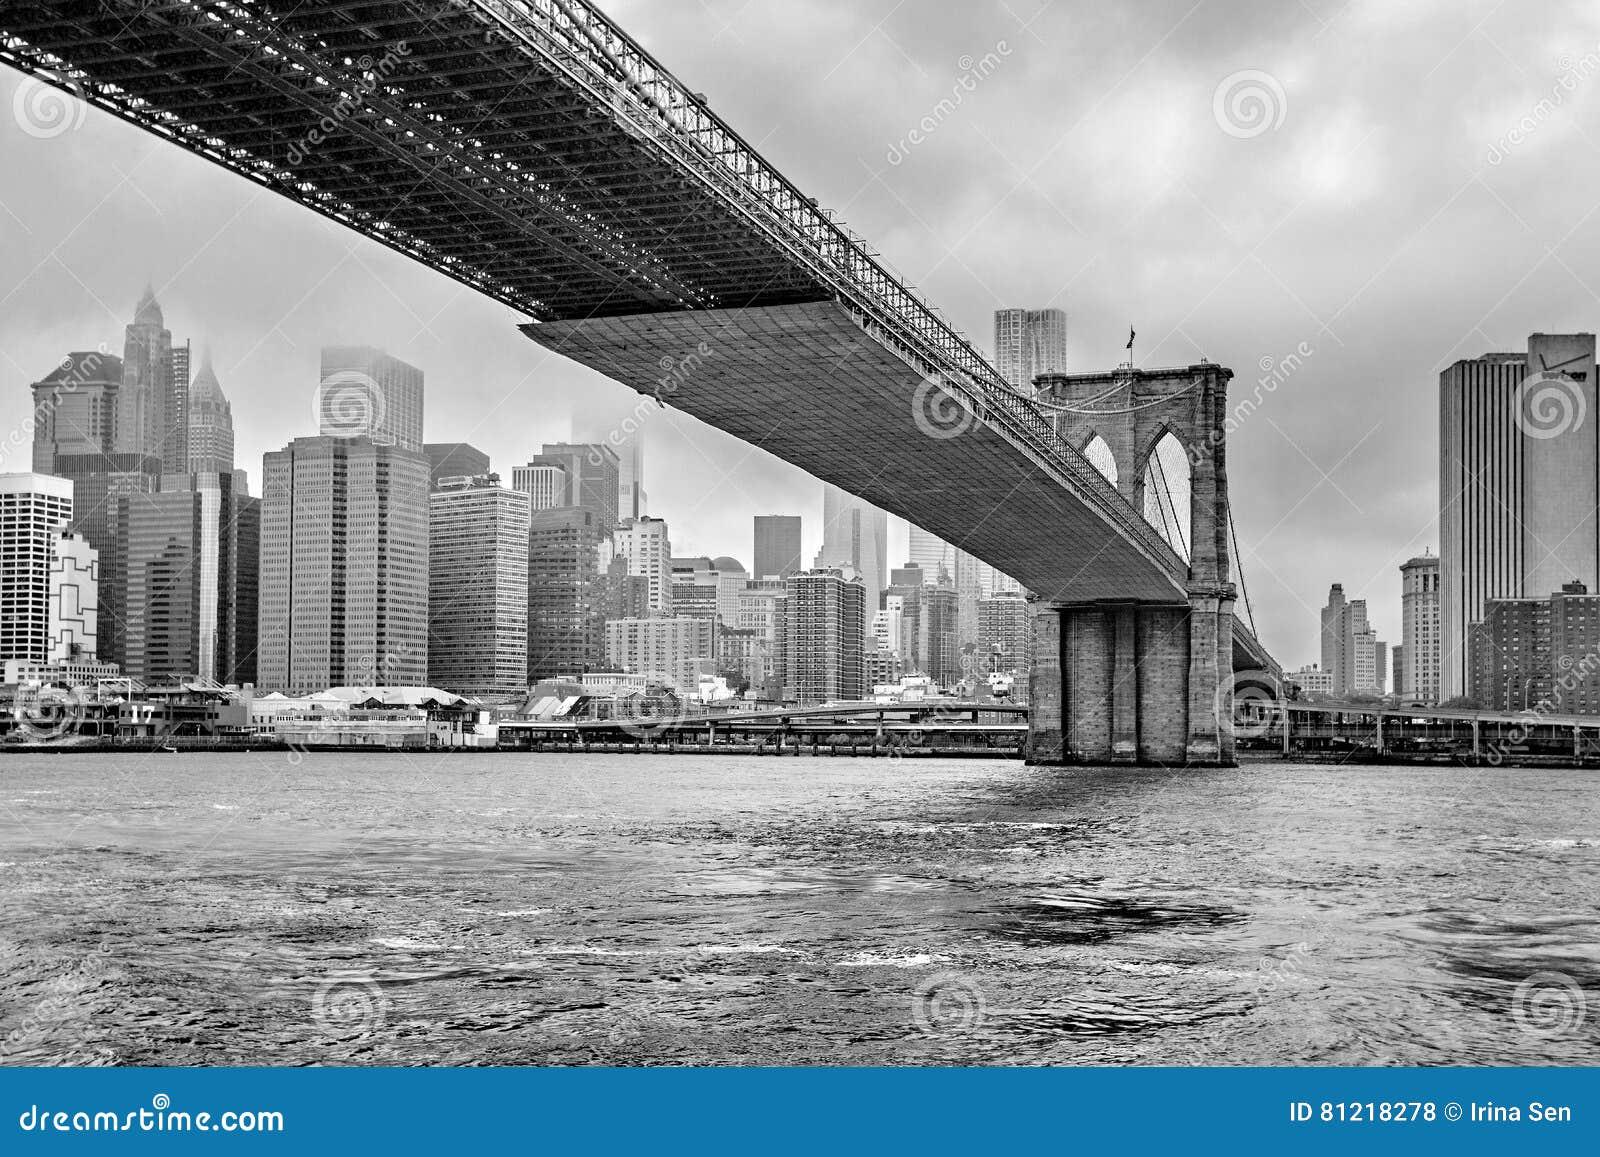 Foggy Manhattan - Manhattan skyline and Brooklyn Bridge, Manhattan, New York, United States